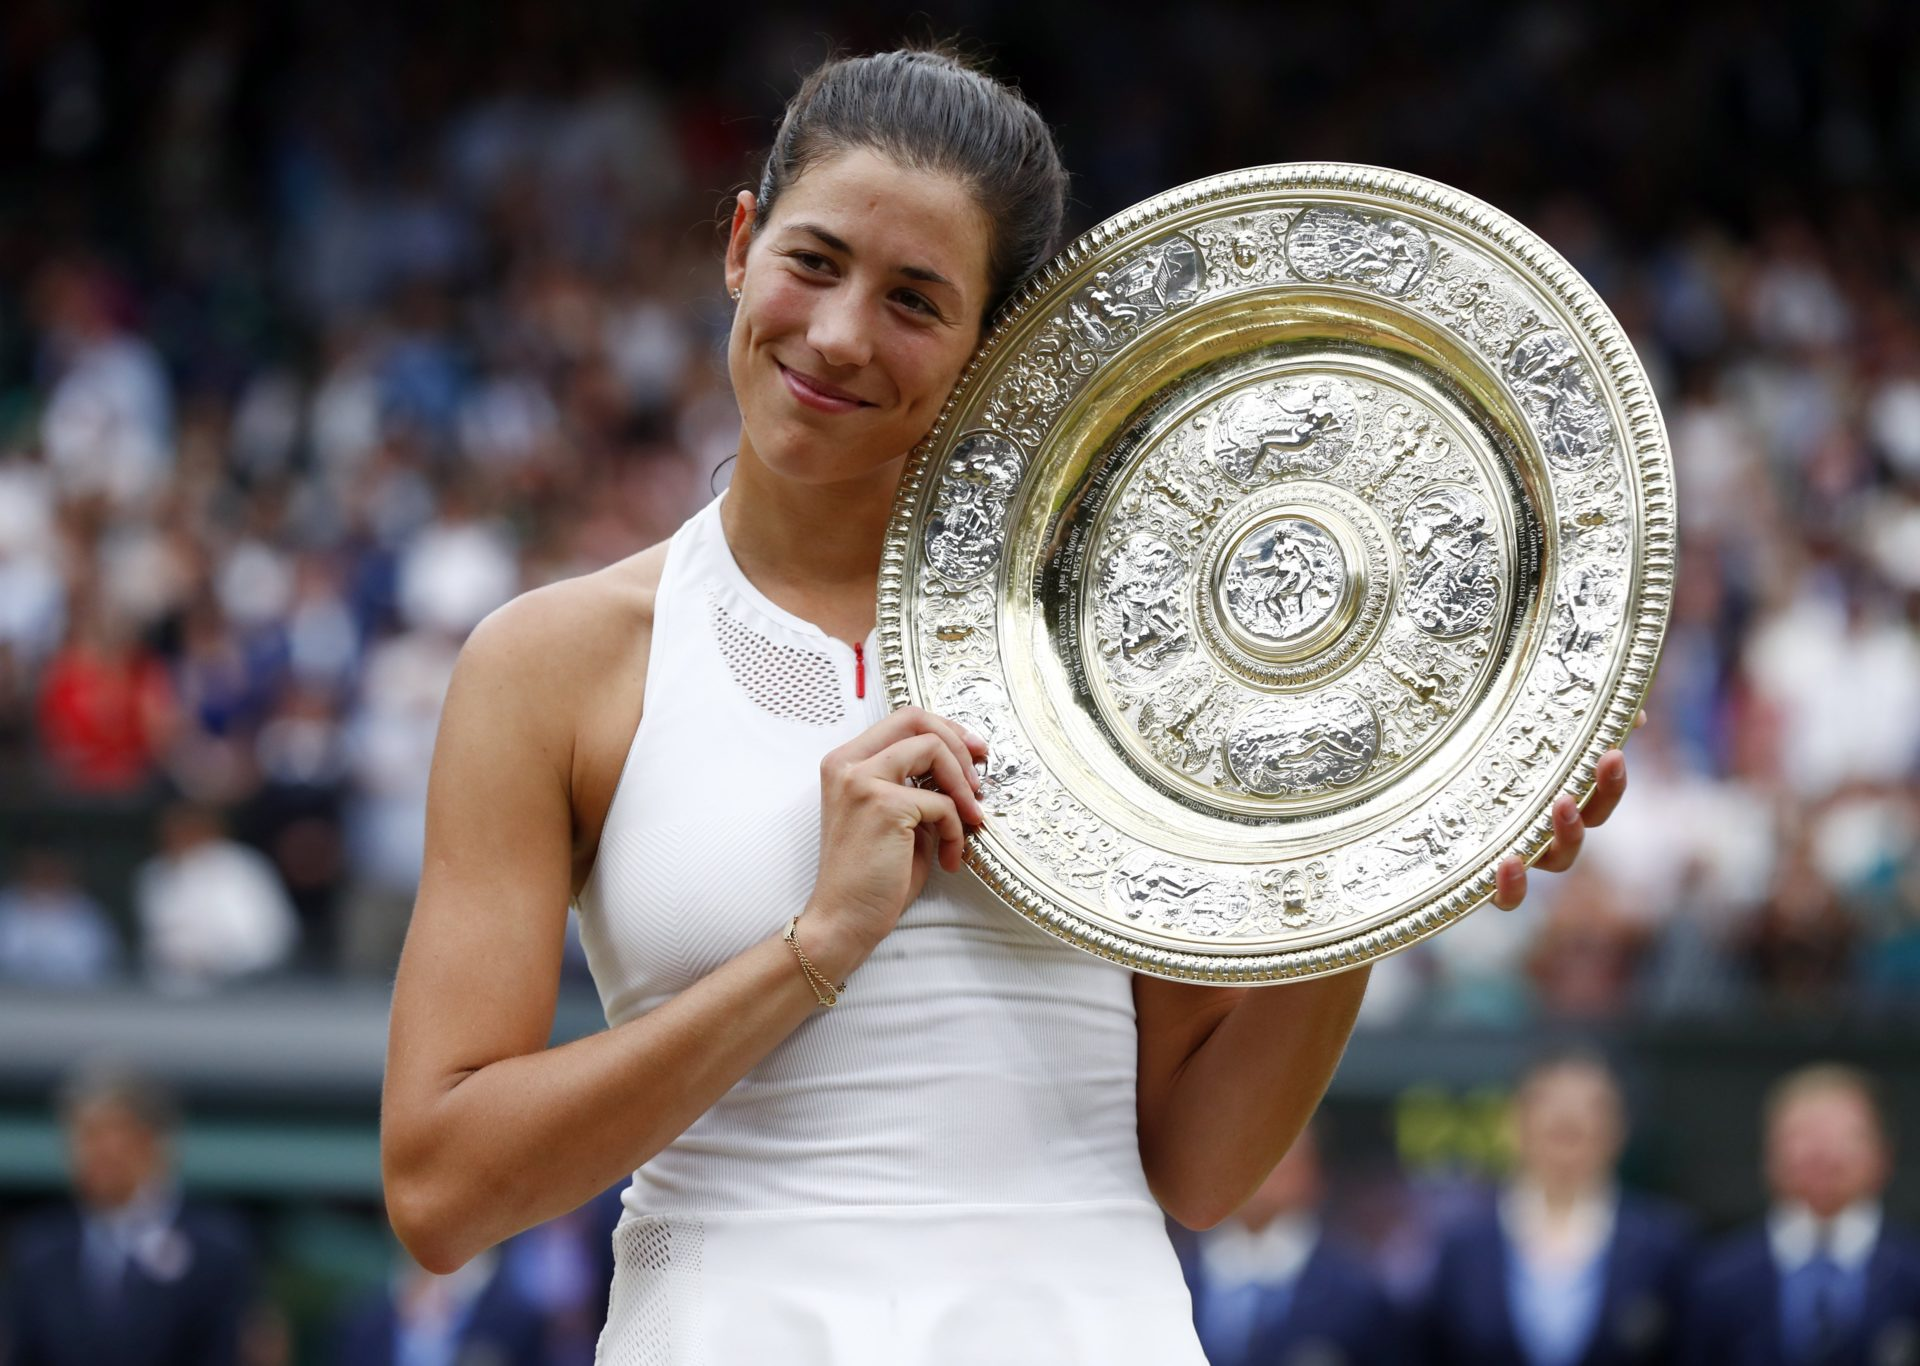 Garbiñe Muguruza posa con el trofeo de campeona de Wimbledon